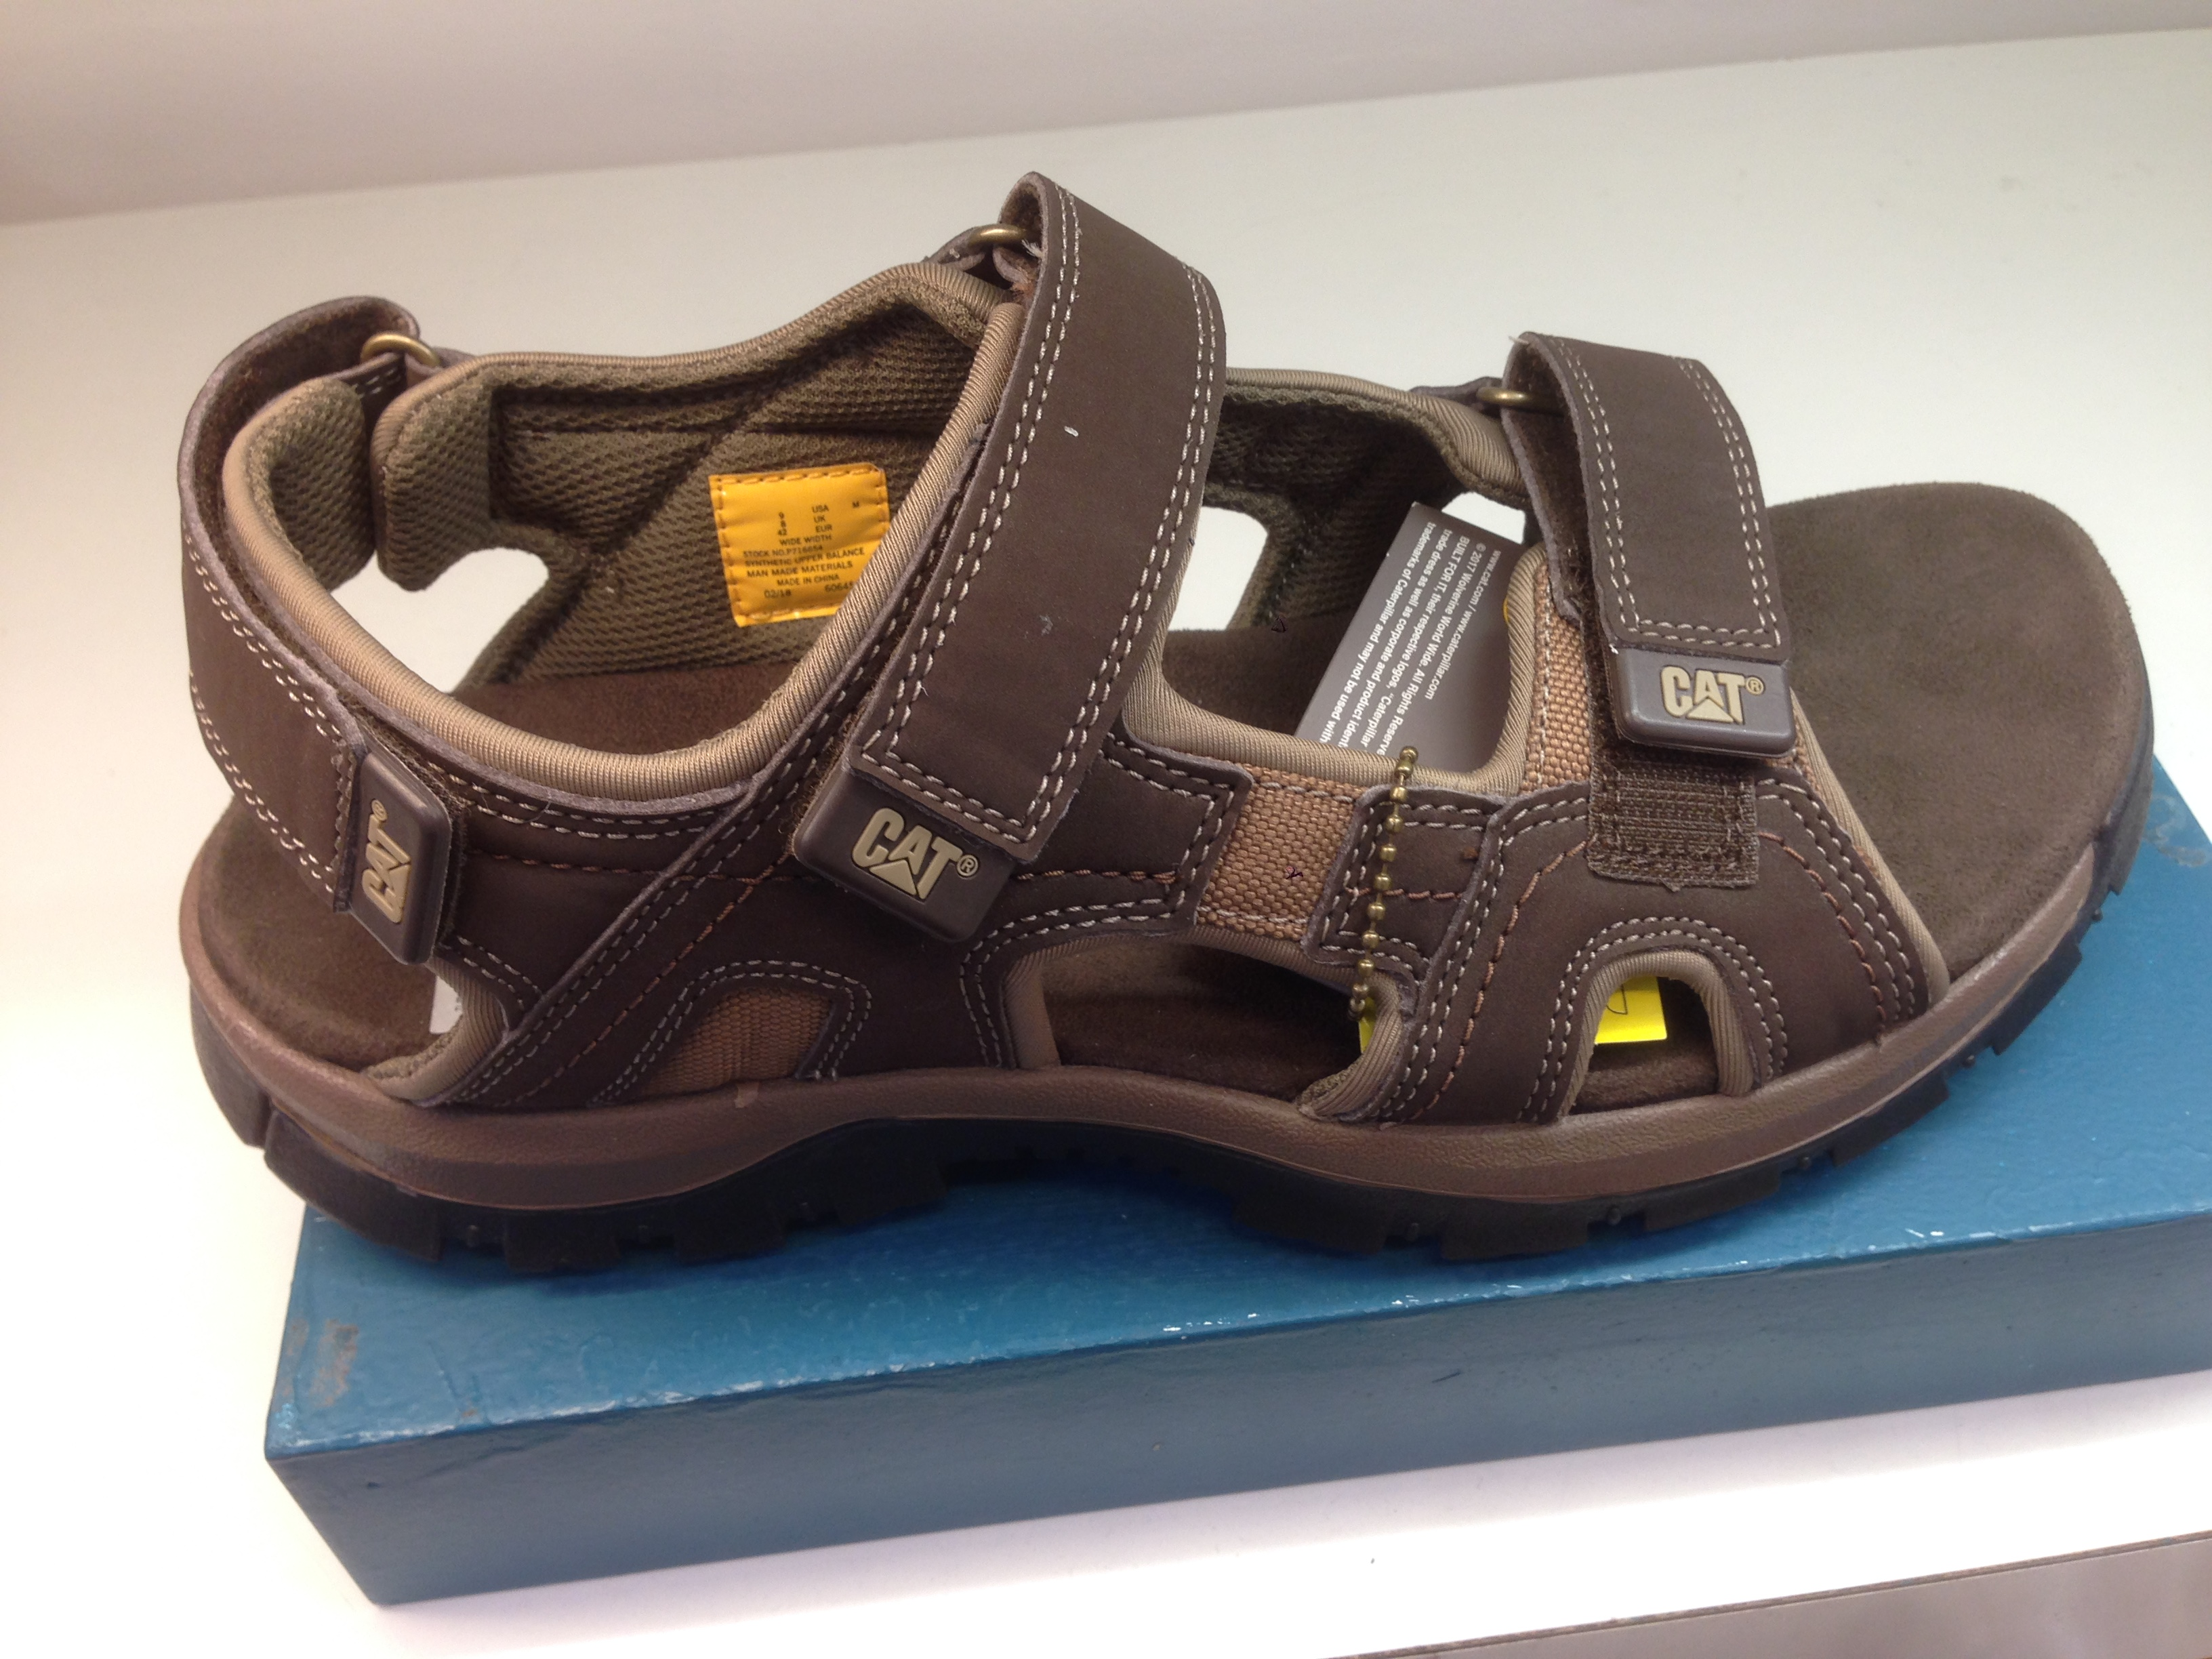 742e79428 Giles Sandal - Casual Sandals